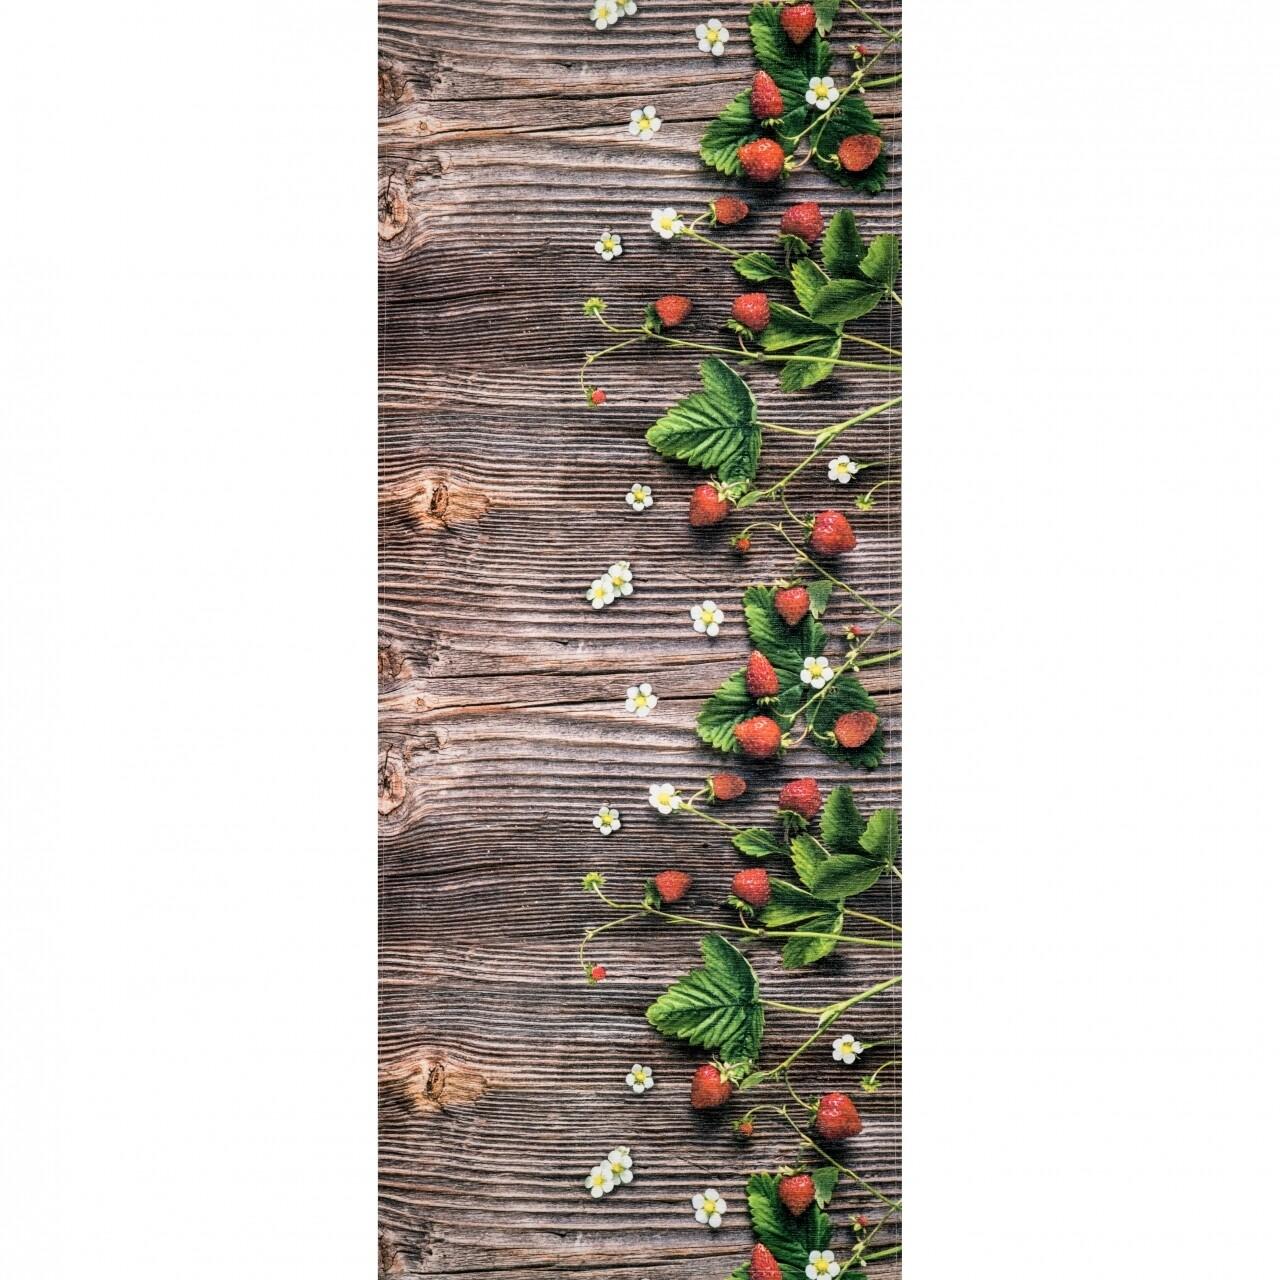 Covor rezistent Webtappeti FRAGOLINE CM 58x190 cm, multicolor